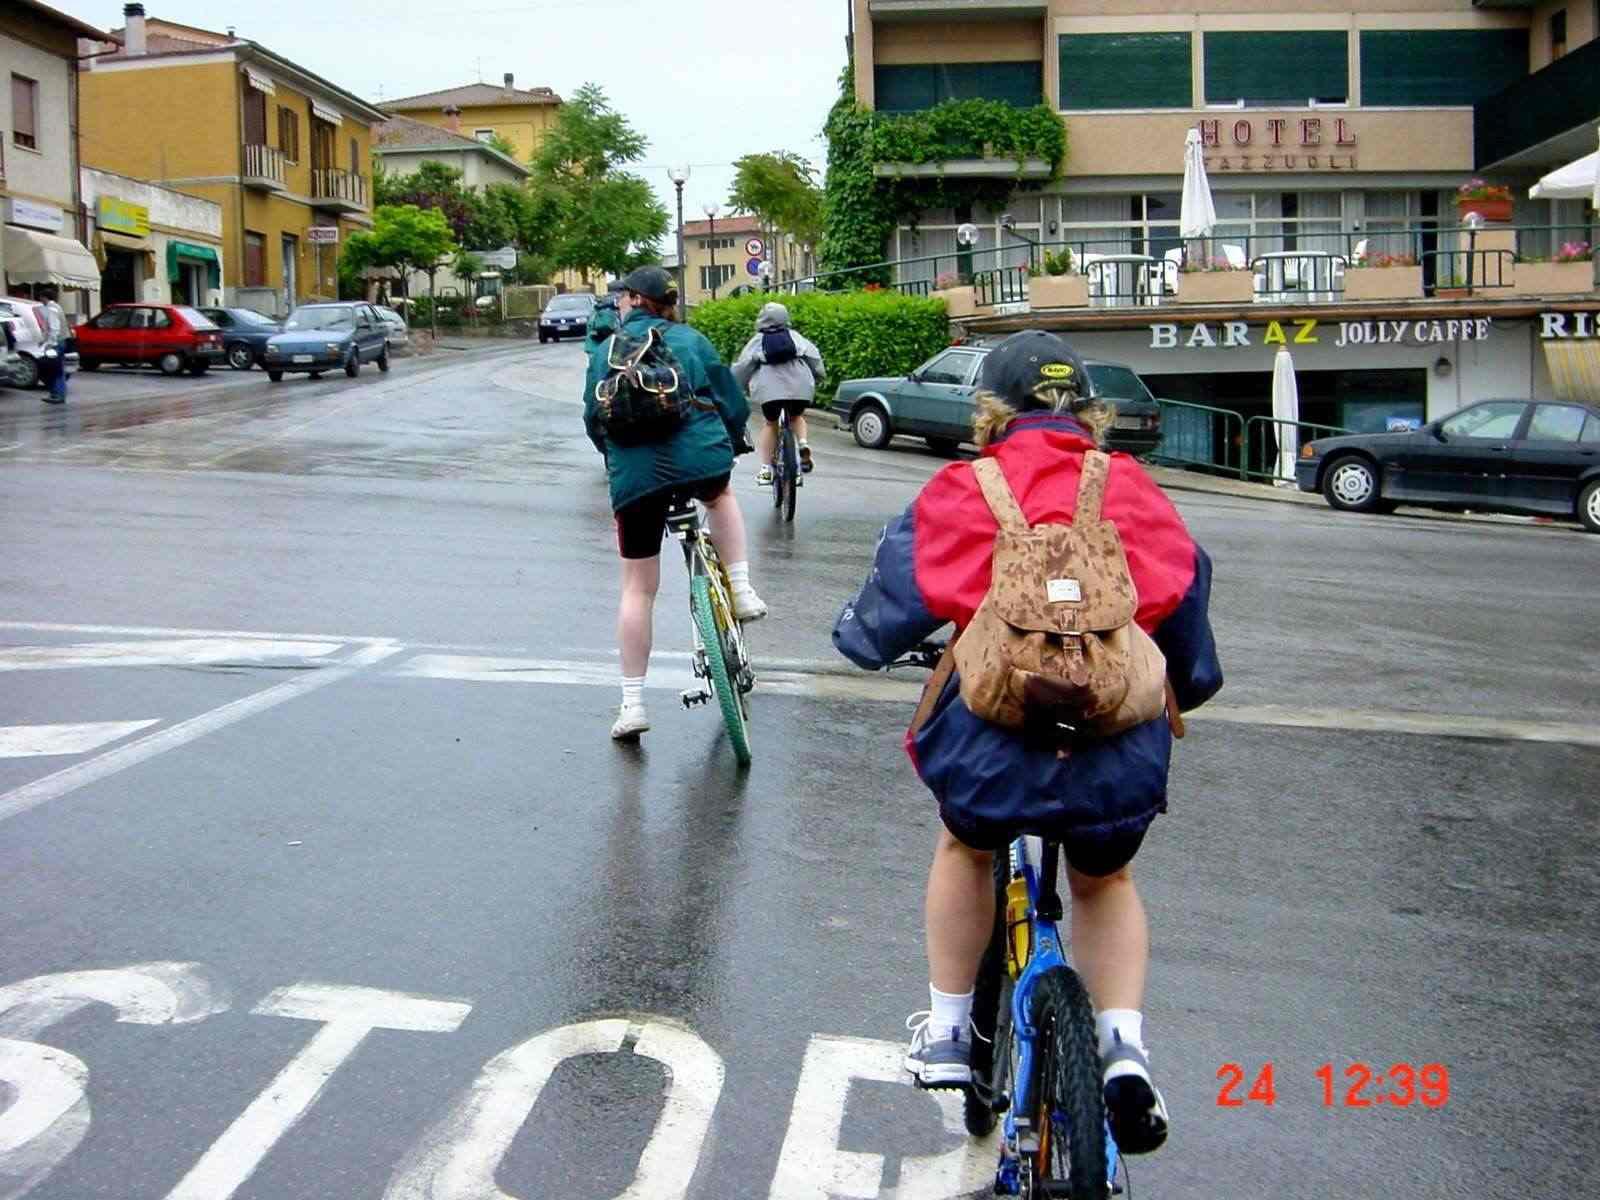 Foto: Manfred Karl / Mountainbike Tour / Von Castiglion Fiorentino zum Lago Trasimeno / Einrollen in Castiglion del Lago / 20.06.2007 17:55:11